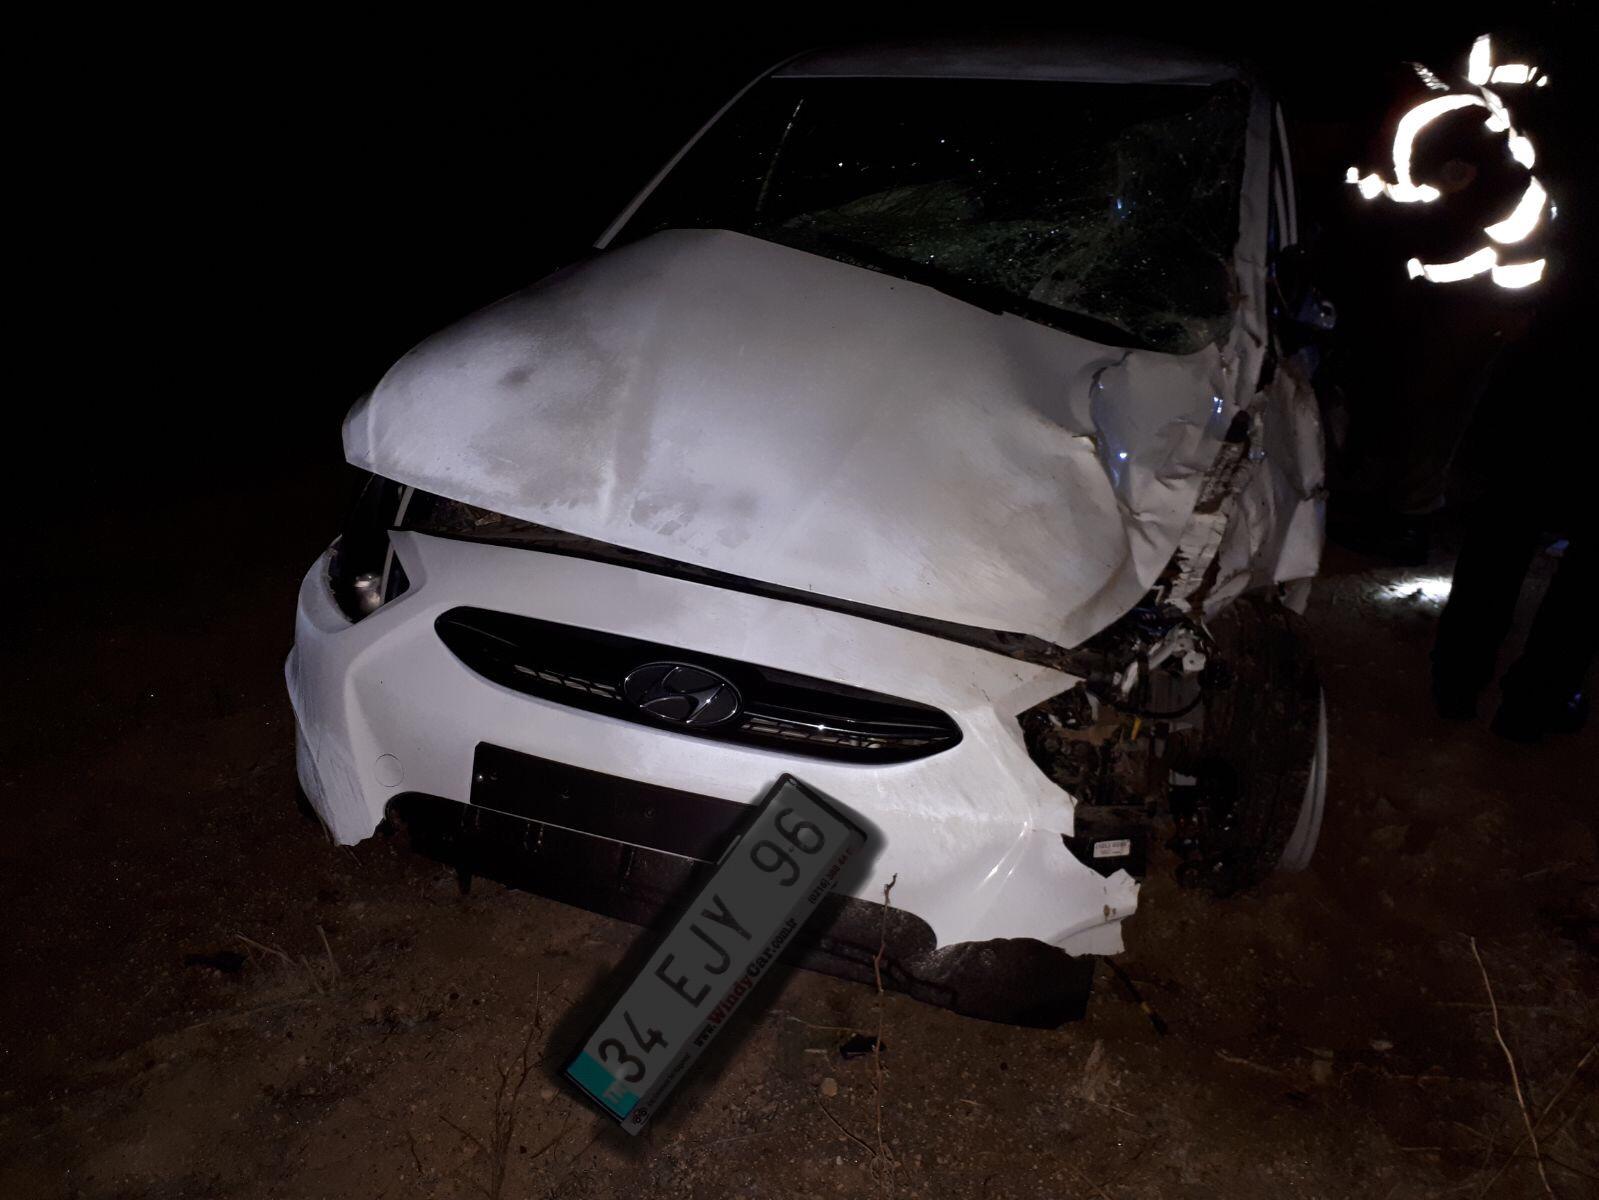 Mustafapaşa yolunda kaza 1 ölü 3